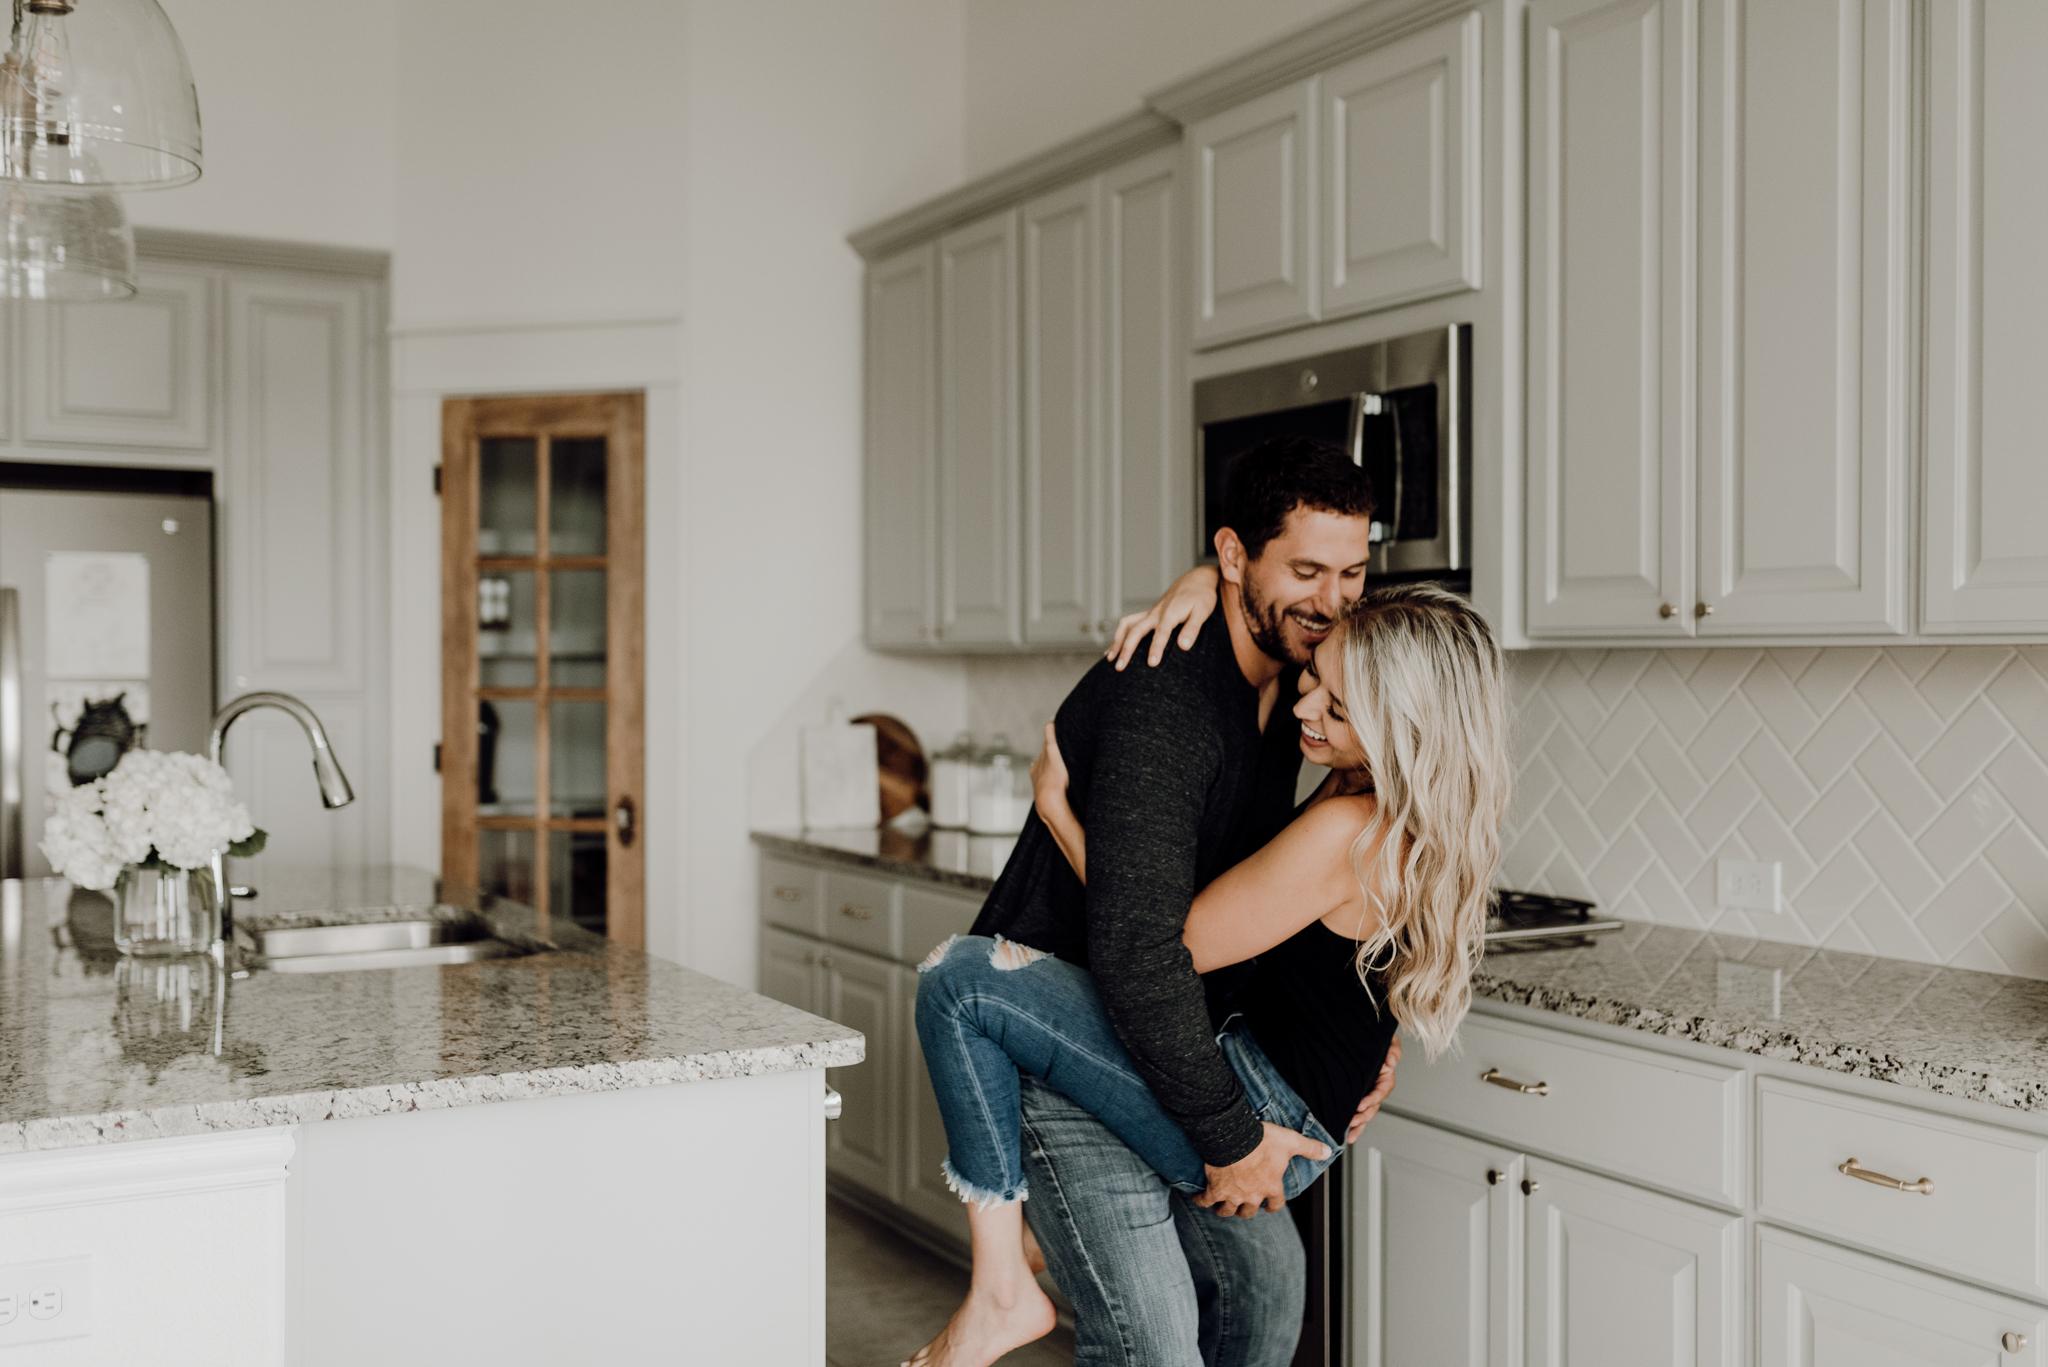 Houston Wedding Photographer-Houston In Home Engagement Session- Houston Wedding Photographer -Kristen Giles Photography-69.jpg